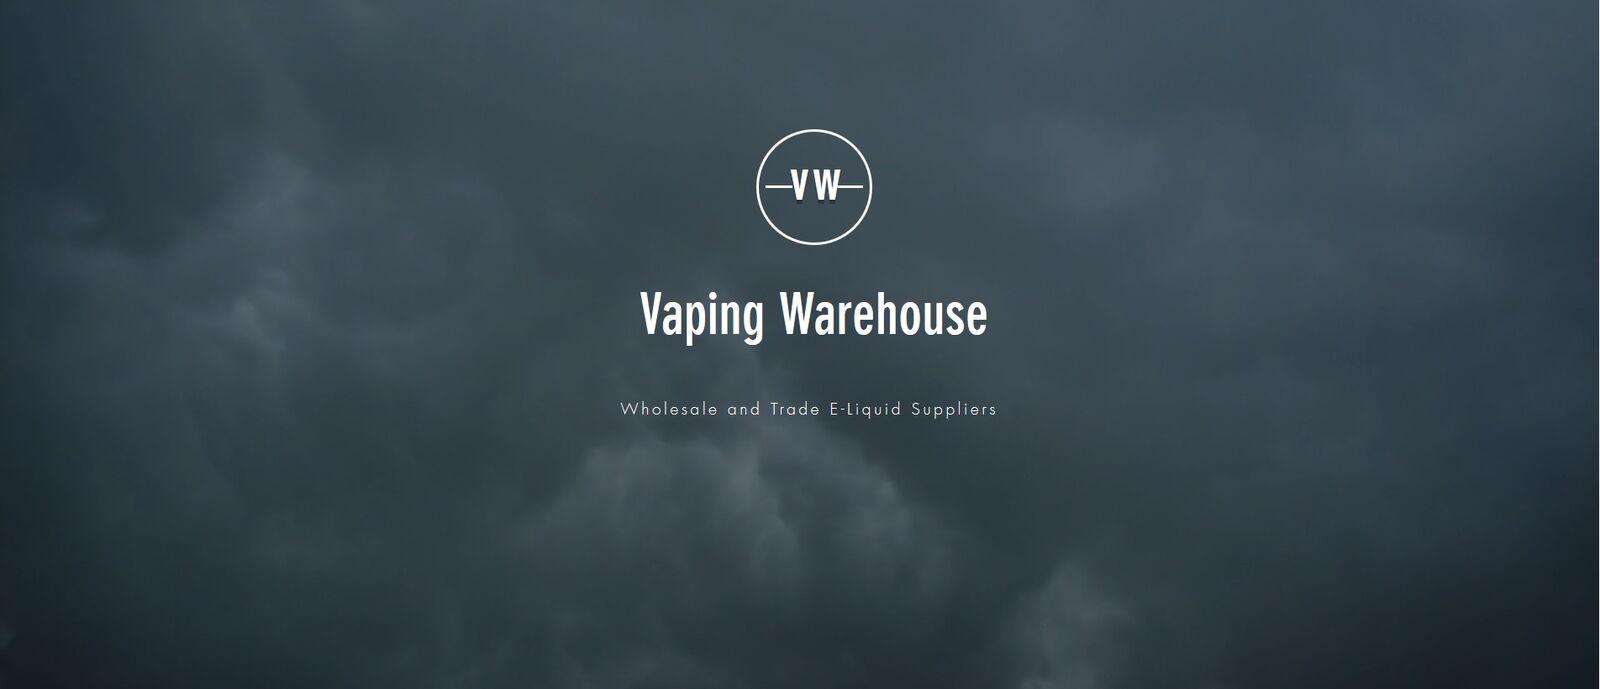 Vaping Warehouse